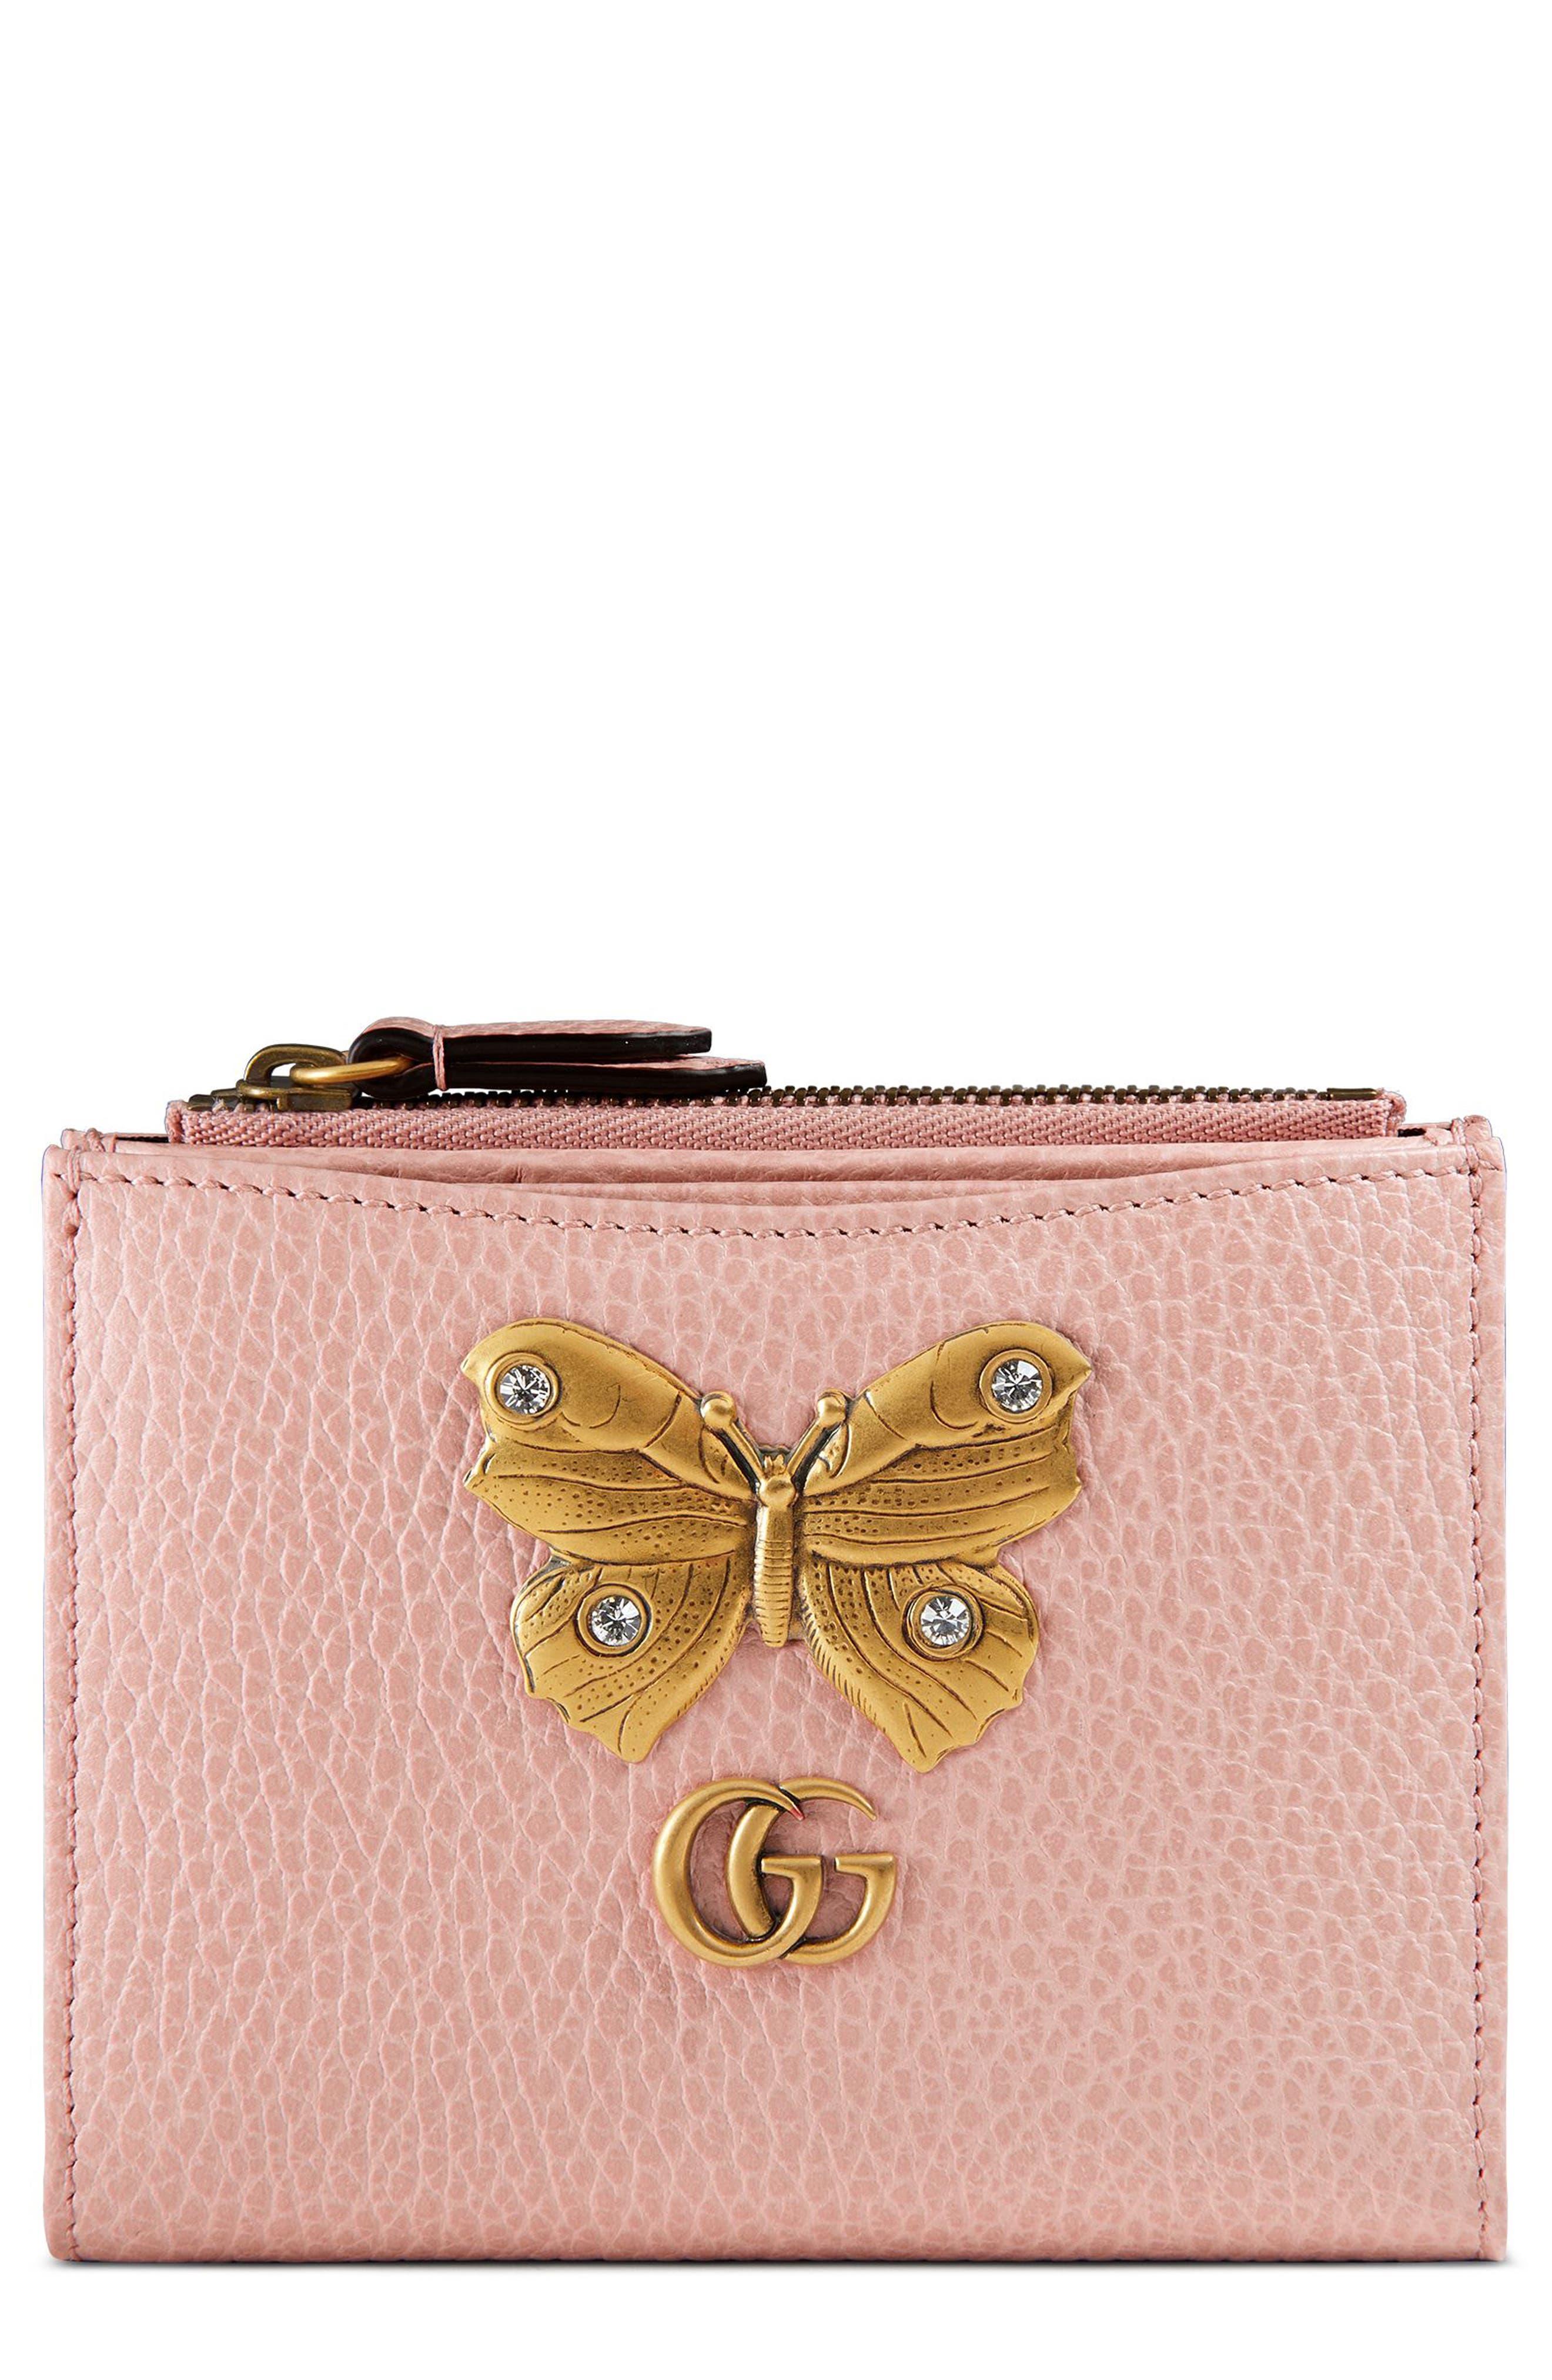 Farfalla Leather Wallet,                             Main thumbnail 1, color,                             Perfect Pink/ Crystal